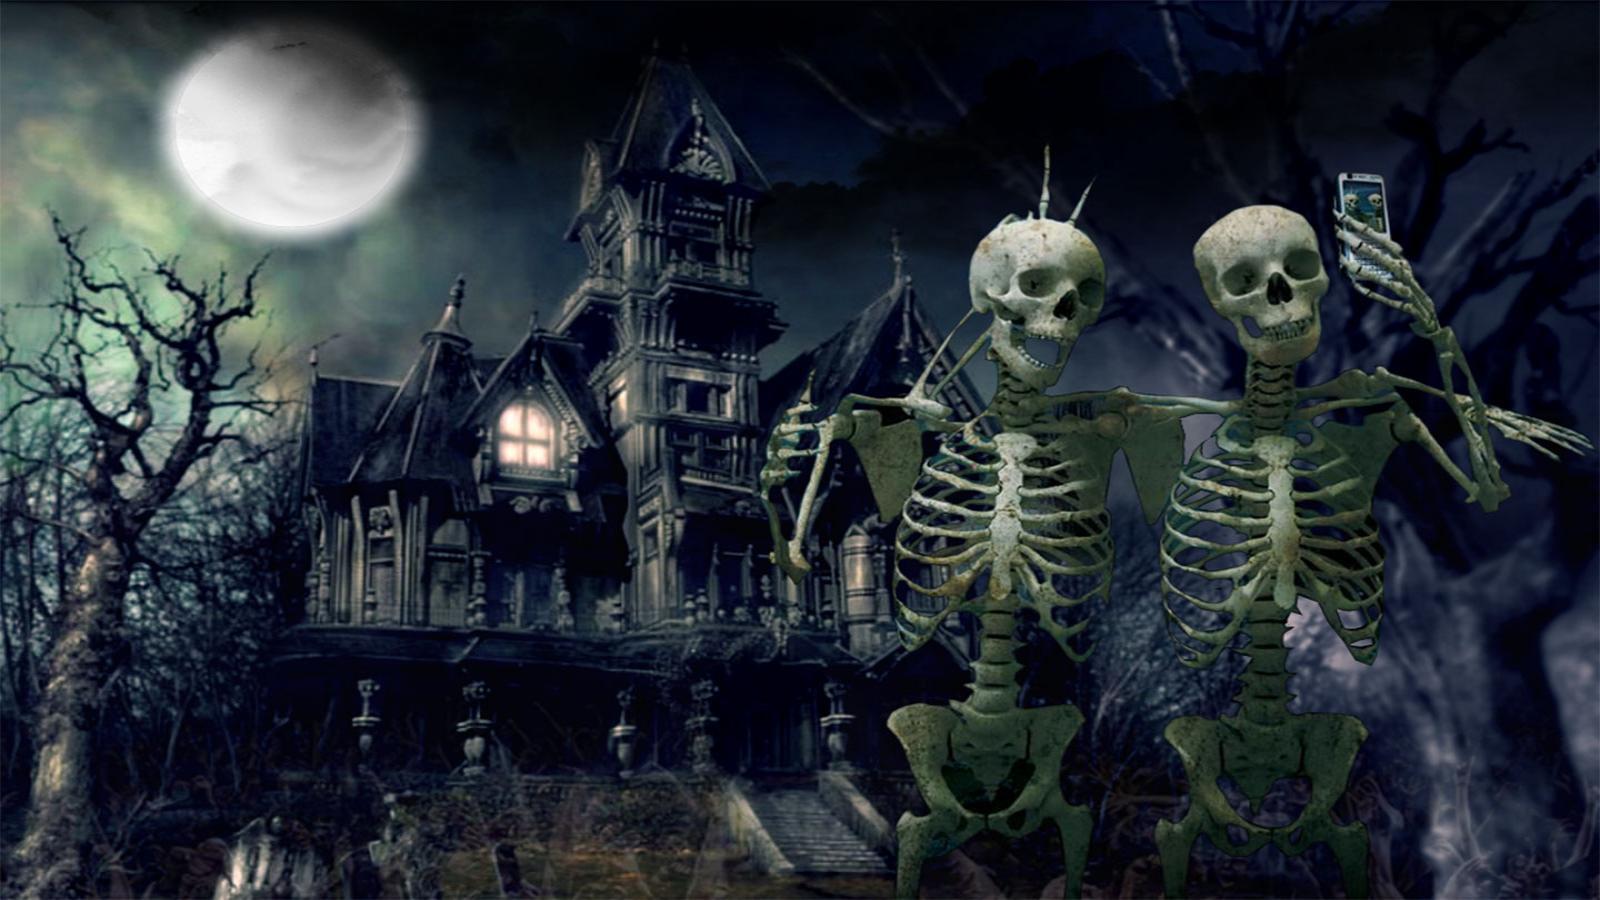 bigbackgroundcomhalloweenscary halloween desktop wallpaperhtml 1600x900